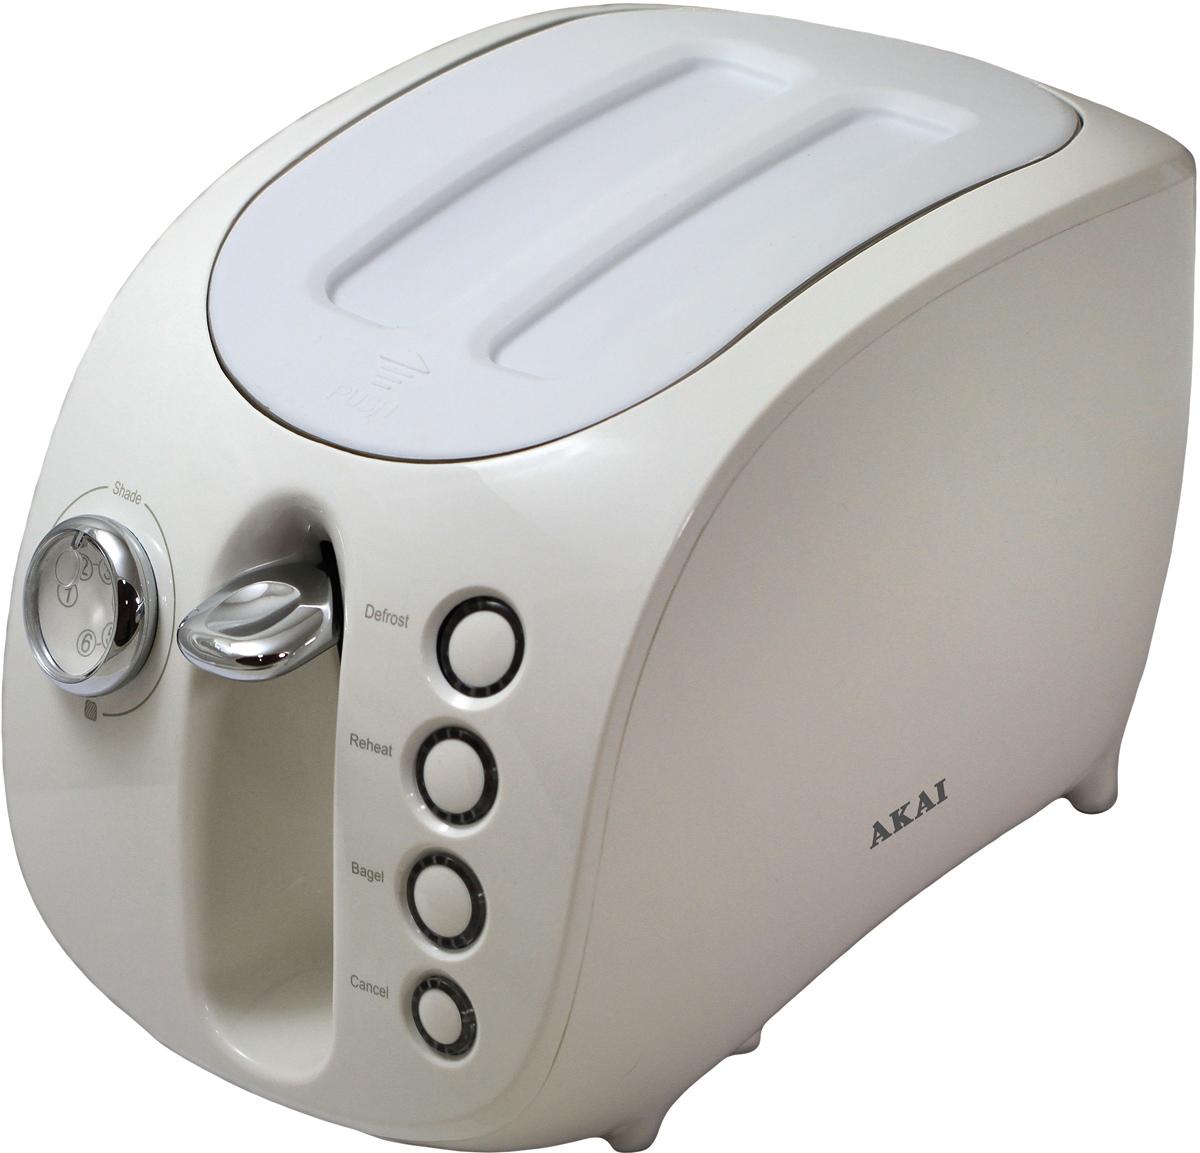 Akai ТР-1110 W, White тостер - Тостеры